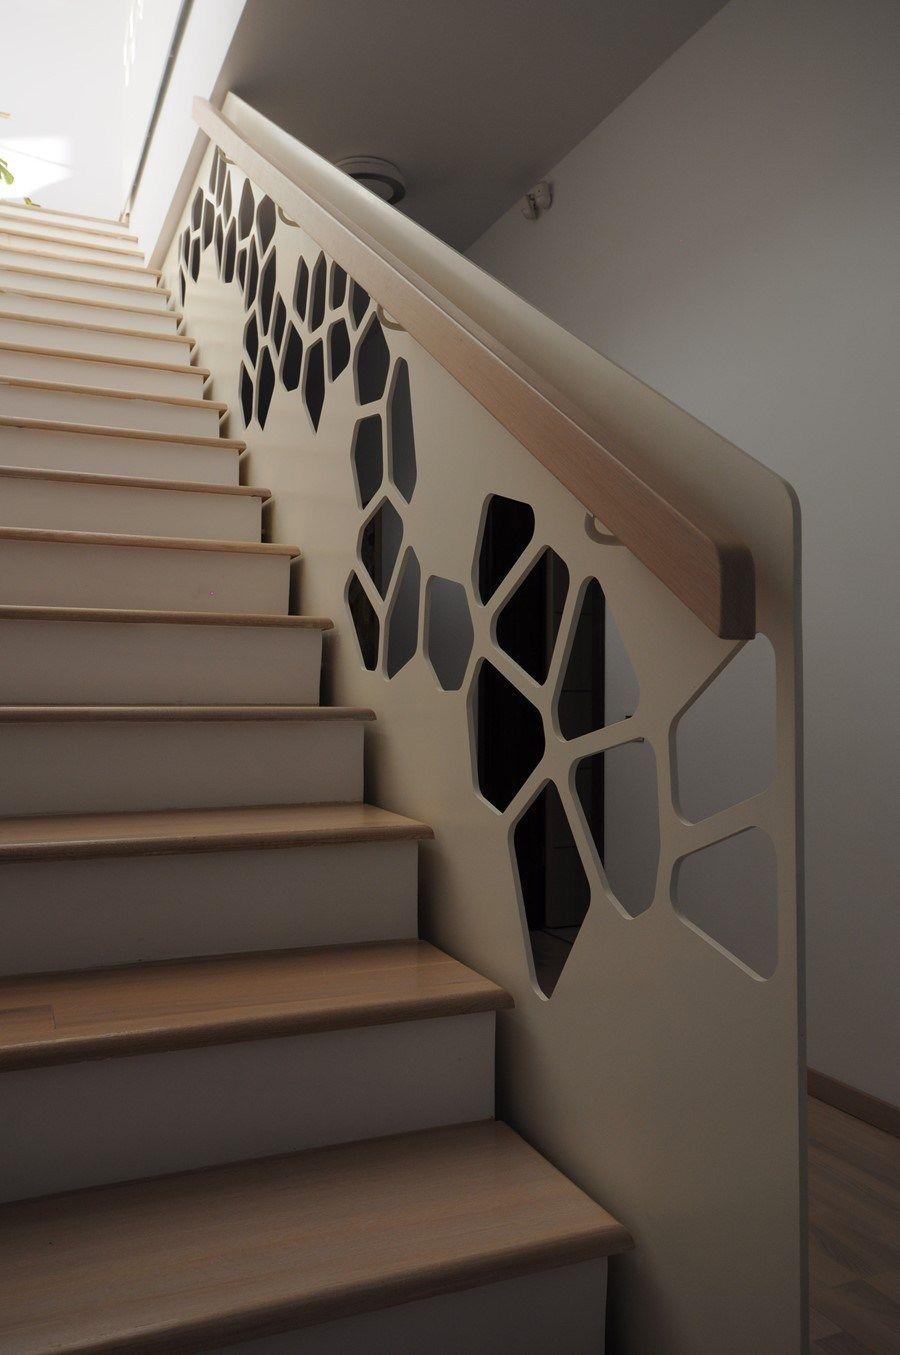 Park View House by Razvan Barsan + Partners